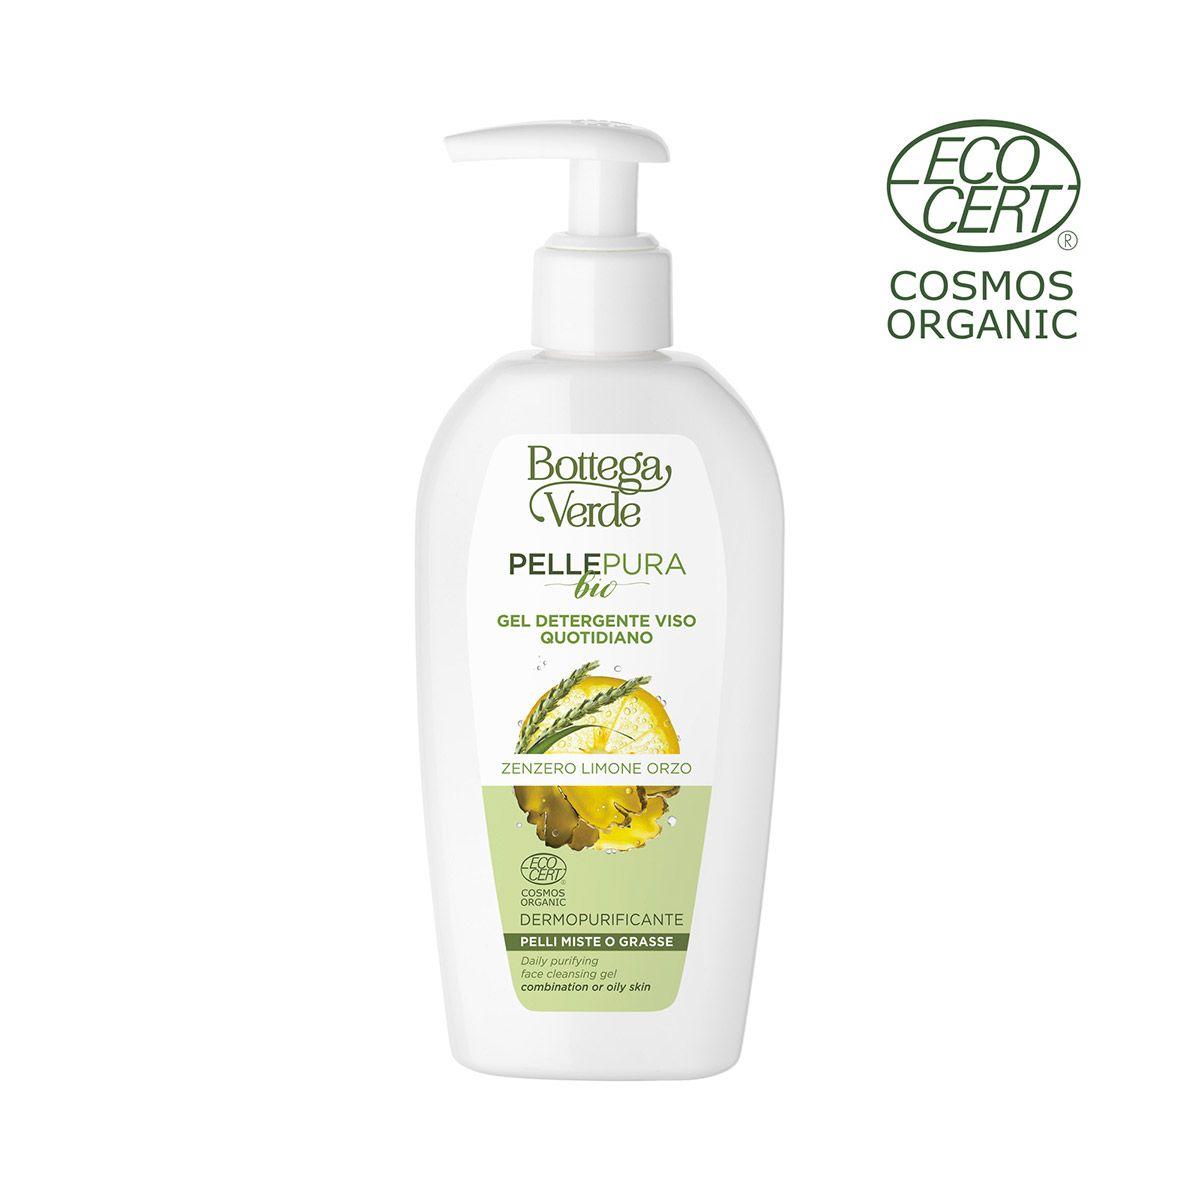 Pelle pura bio – Gel detergente viso quotidiano, dermopurificante, con estratto …